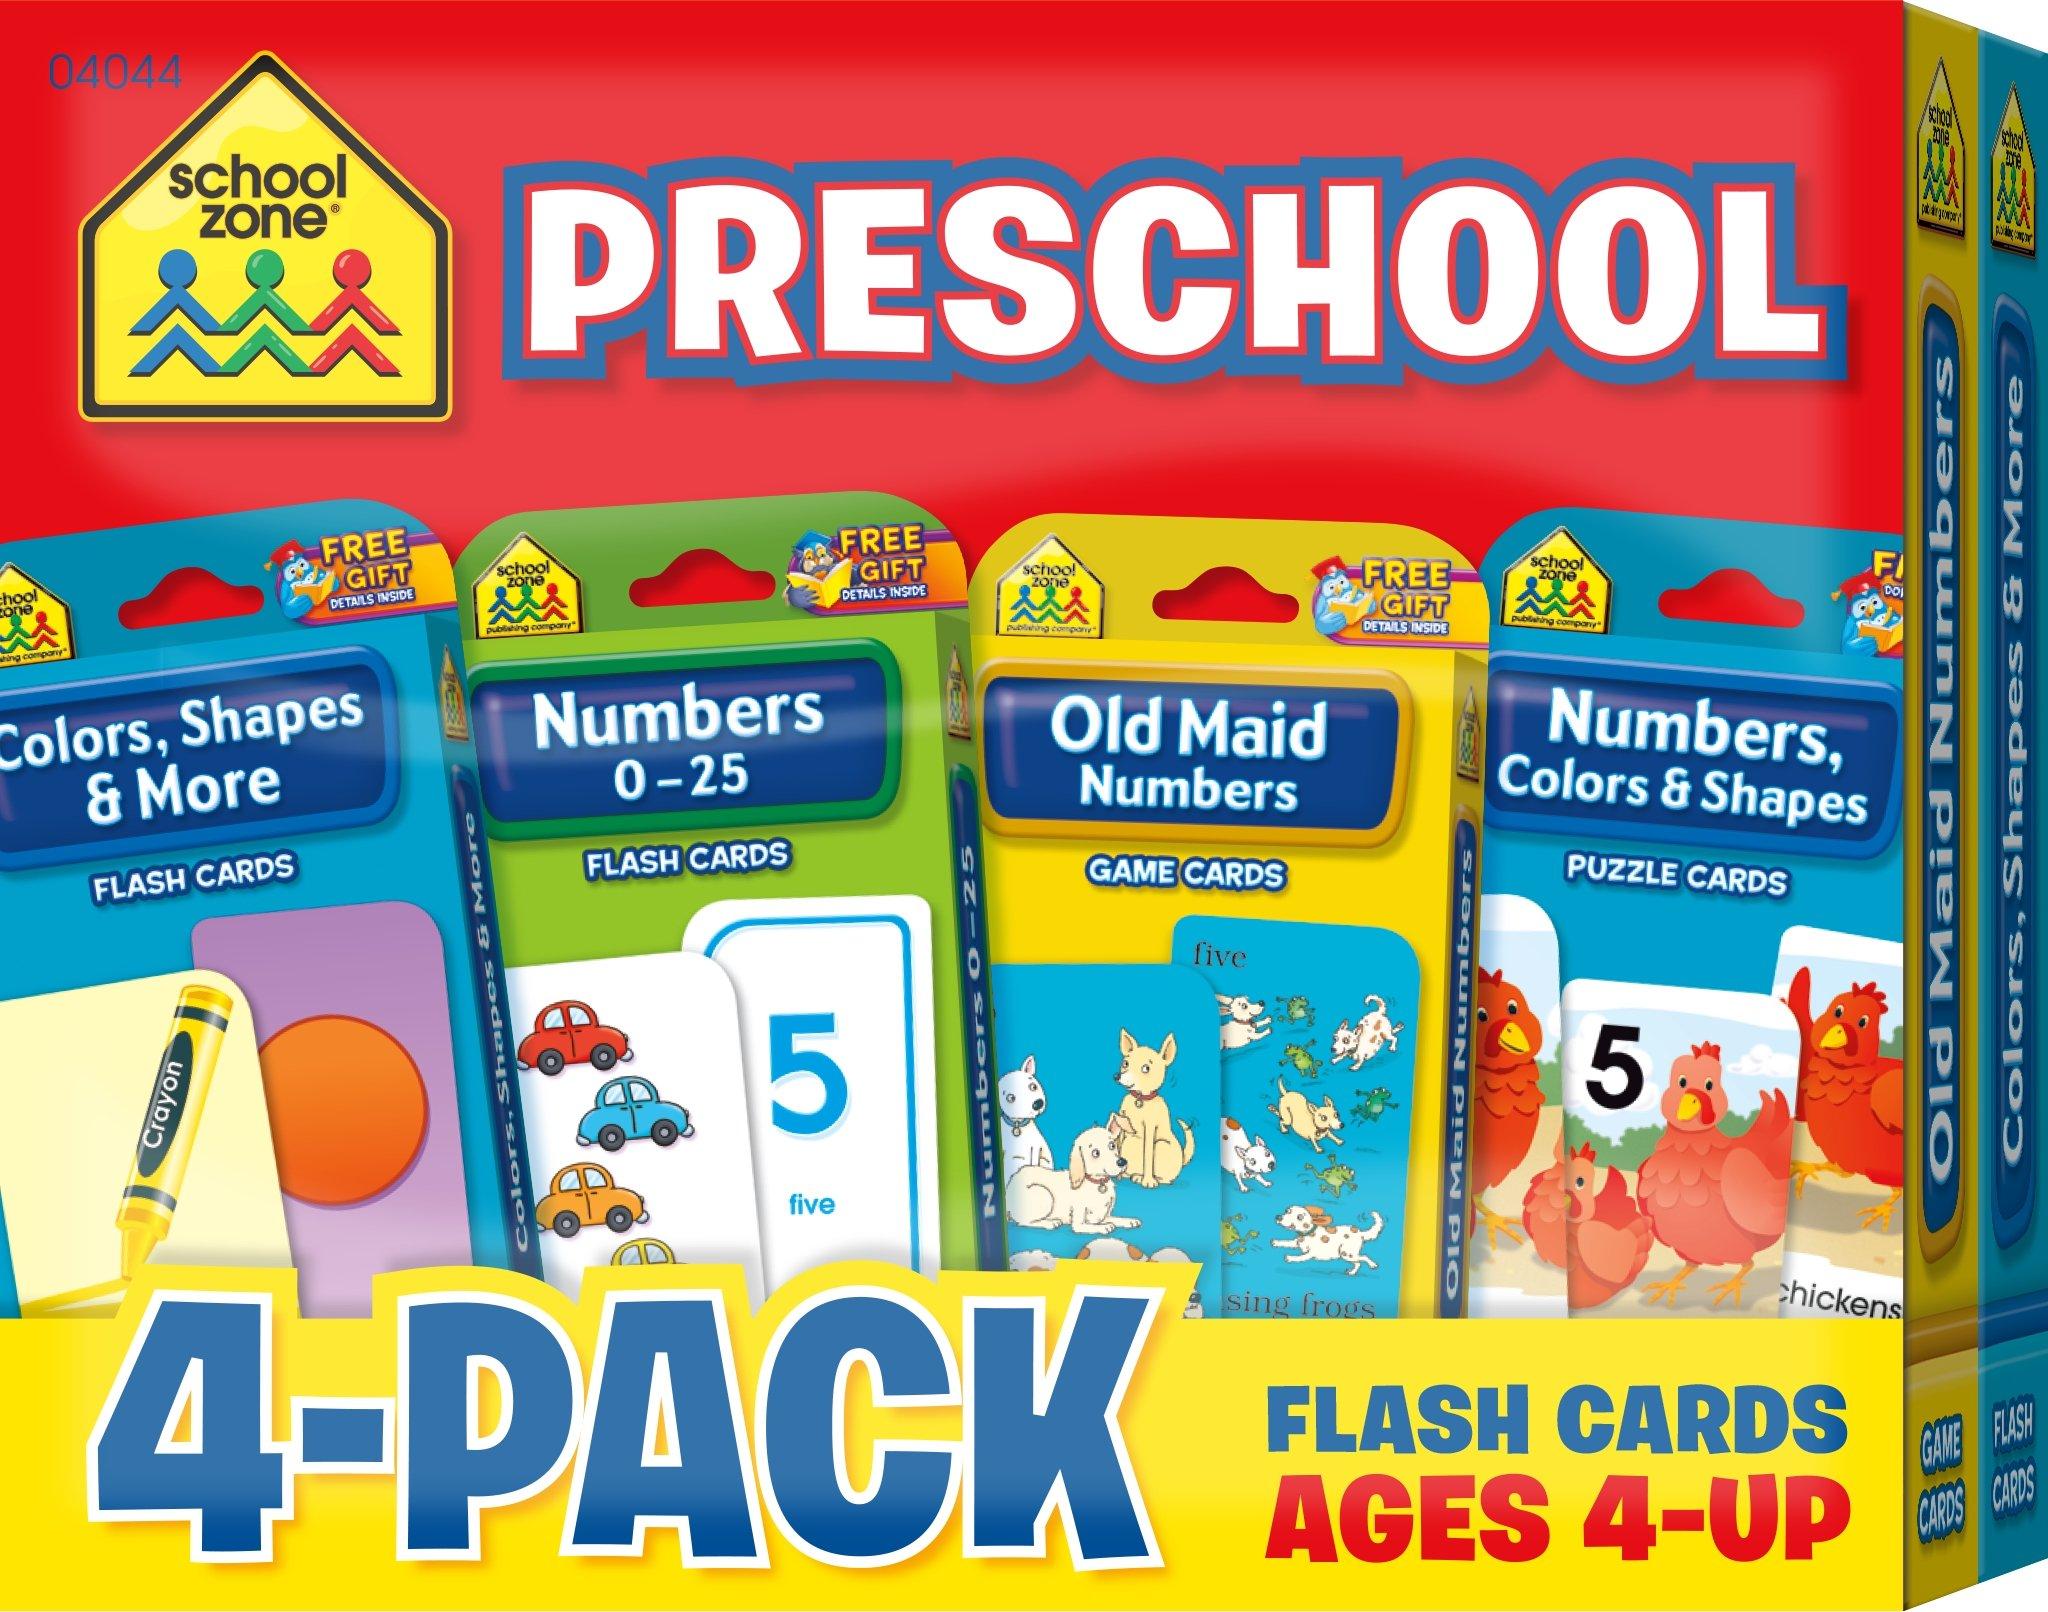 School Zone - Preschool Flash Card 4-Pack, ages 4 - up, kids\' games ...